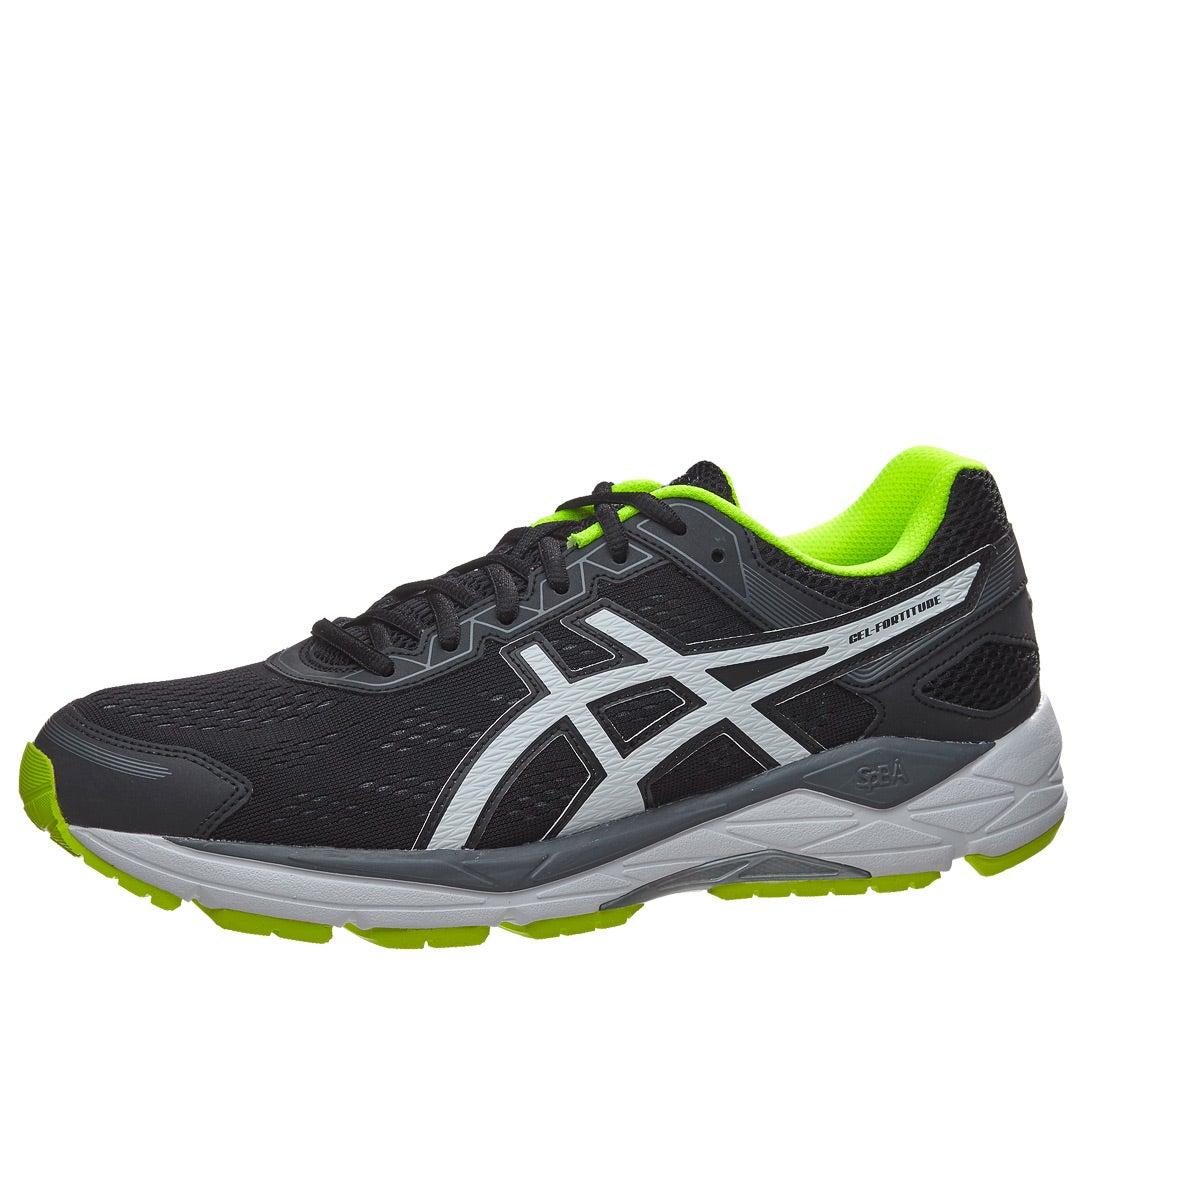 ASICS Gel Fortitude 7 Hommes Chaussures Chaussures 360 Noir/ Blanc à/ Jaune Vue à 360 ° 3daaaa2 - dhsocialbookmrking.website